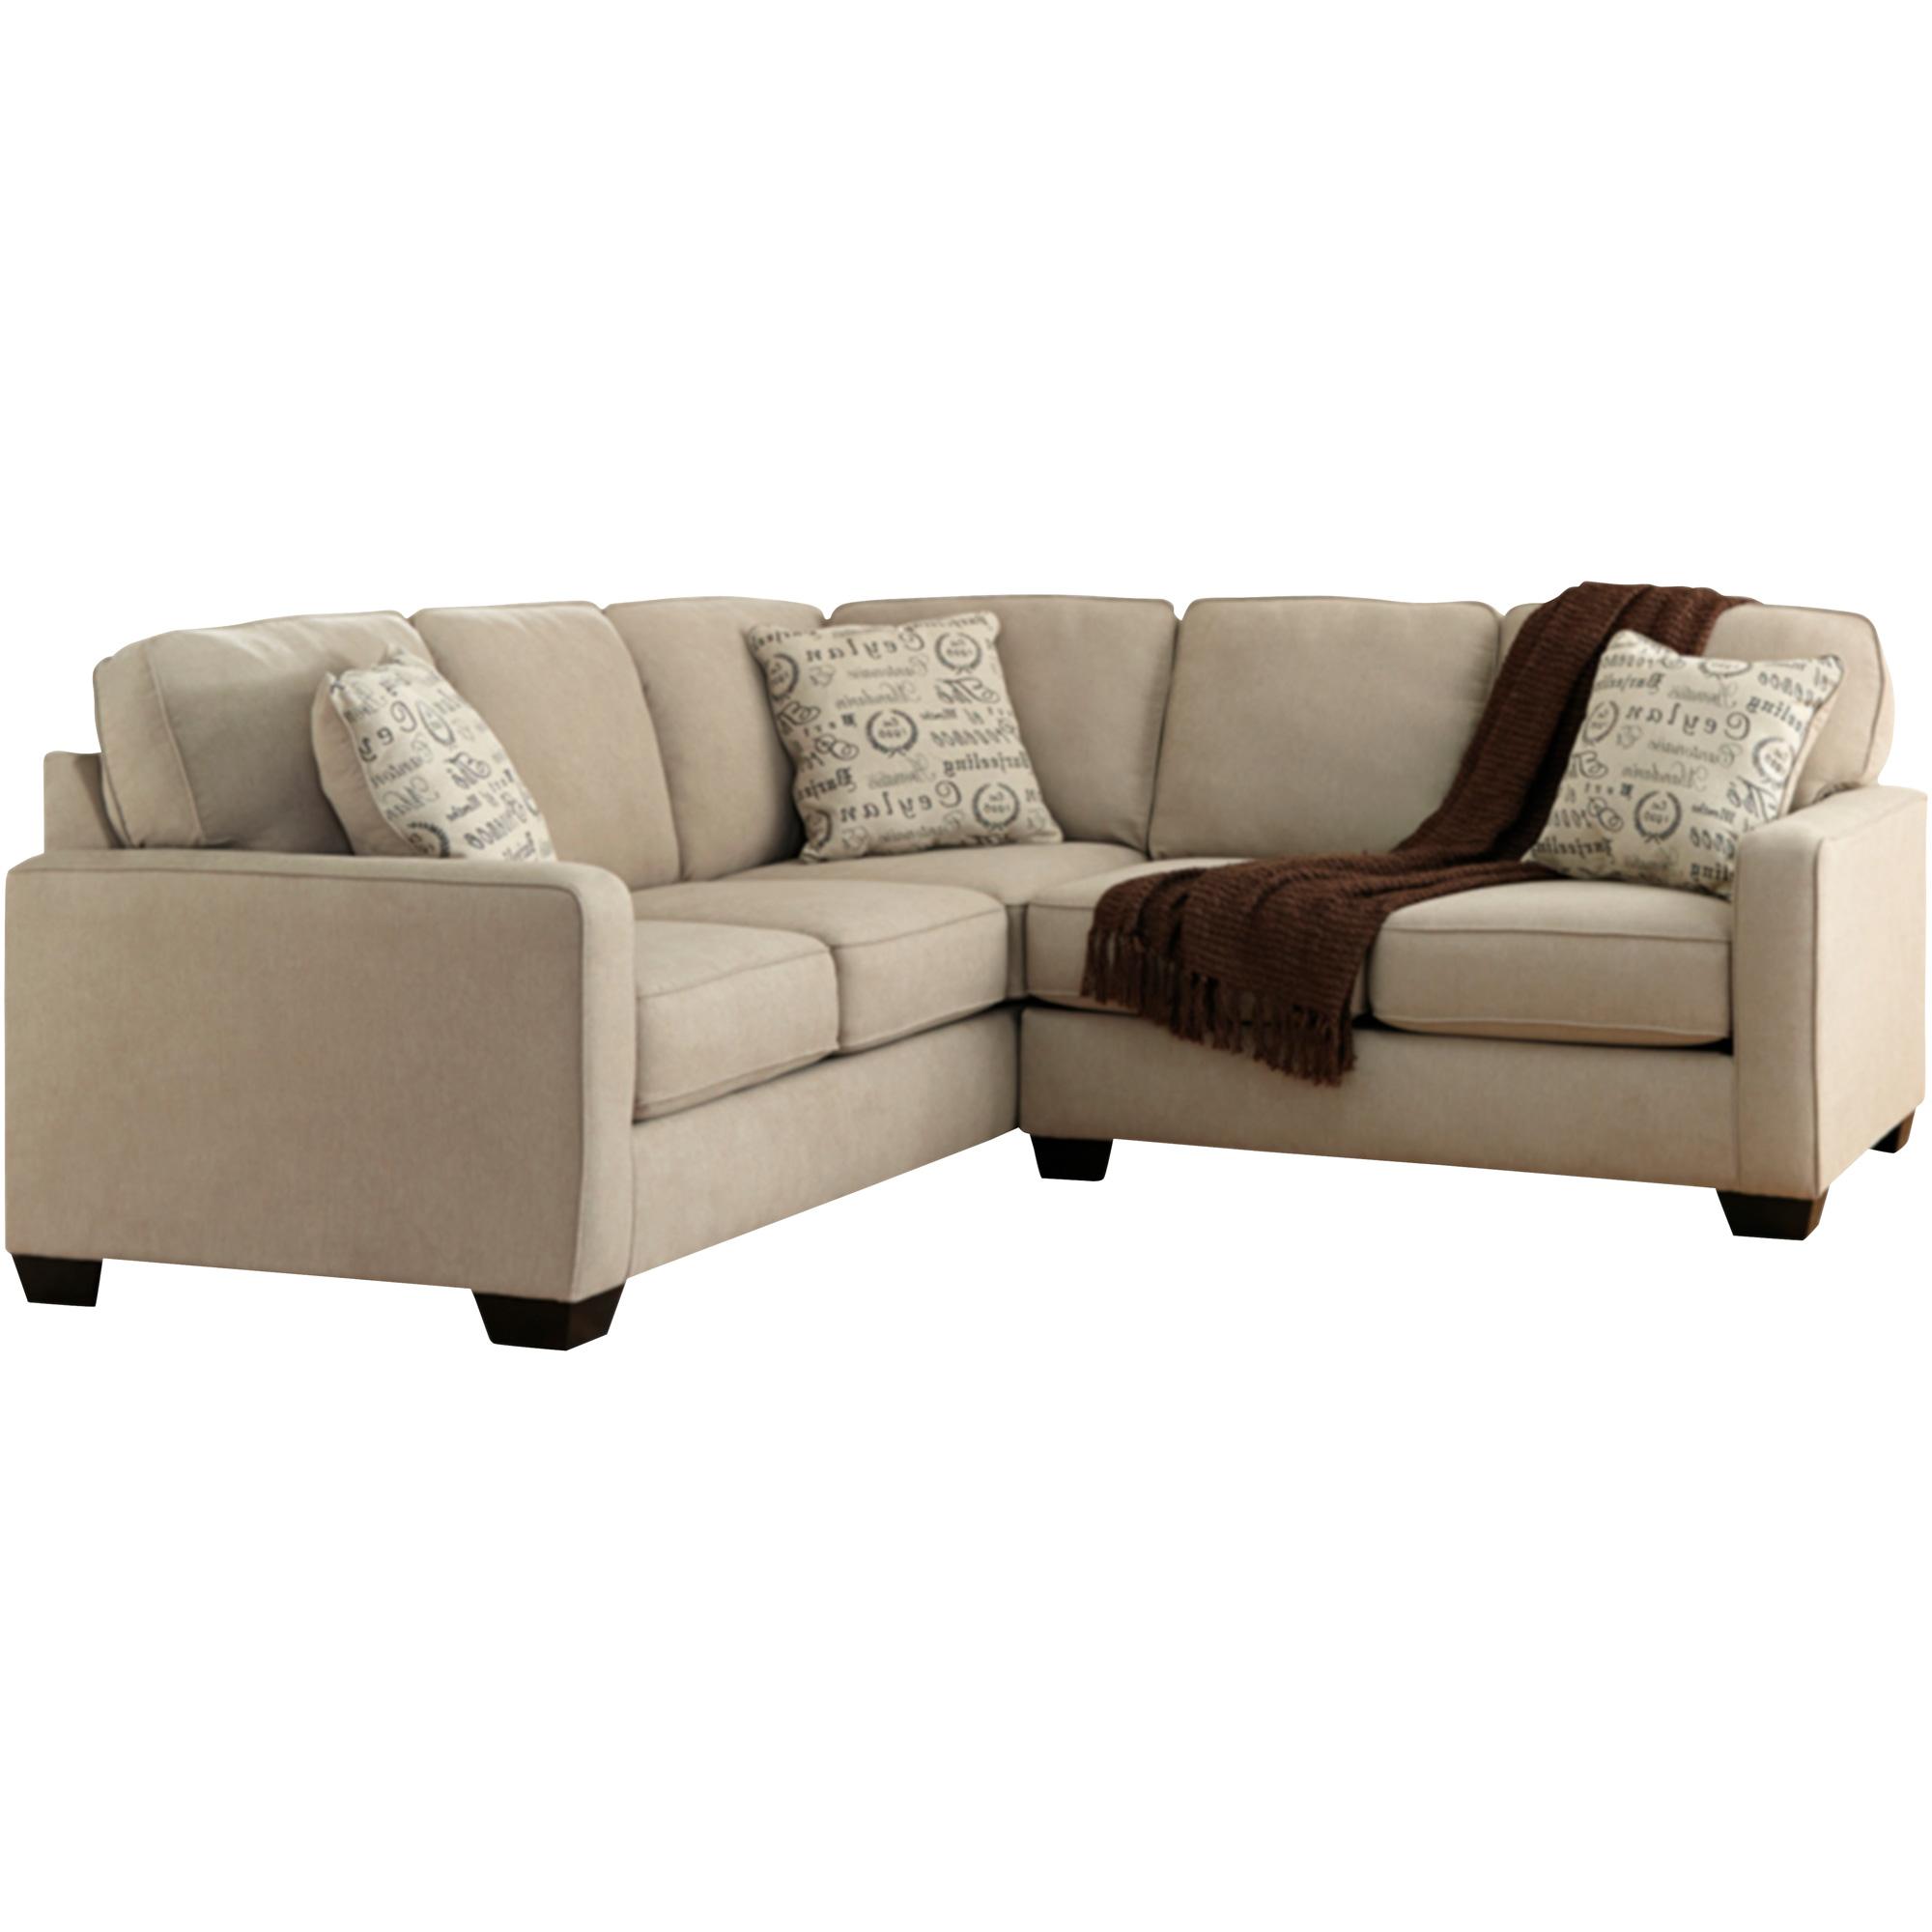 Ashley Furniture | Alenya Quartz 2 Piece Right Sectional Sofa